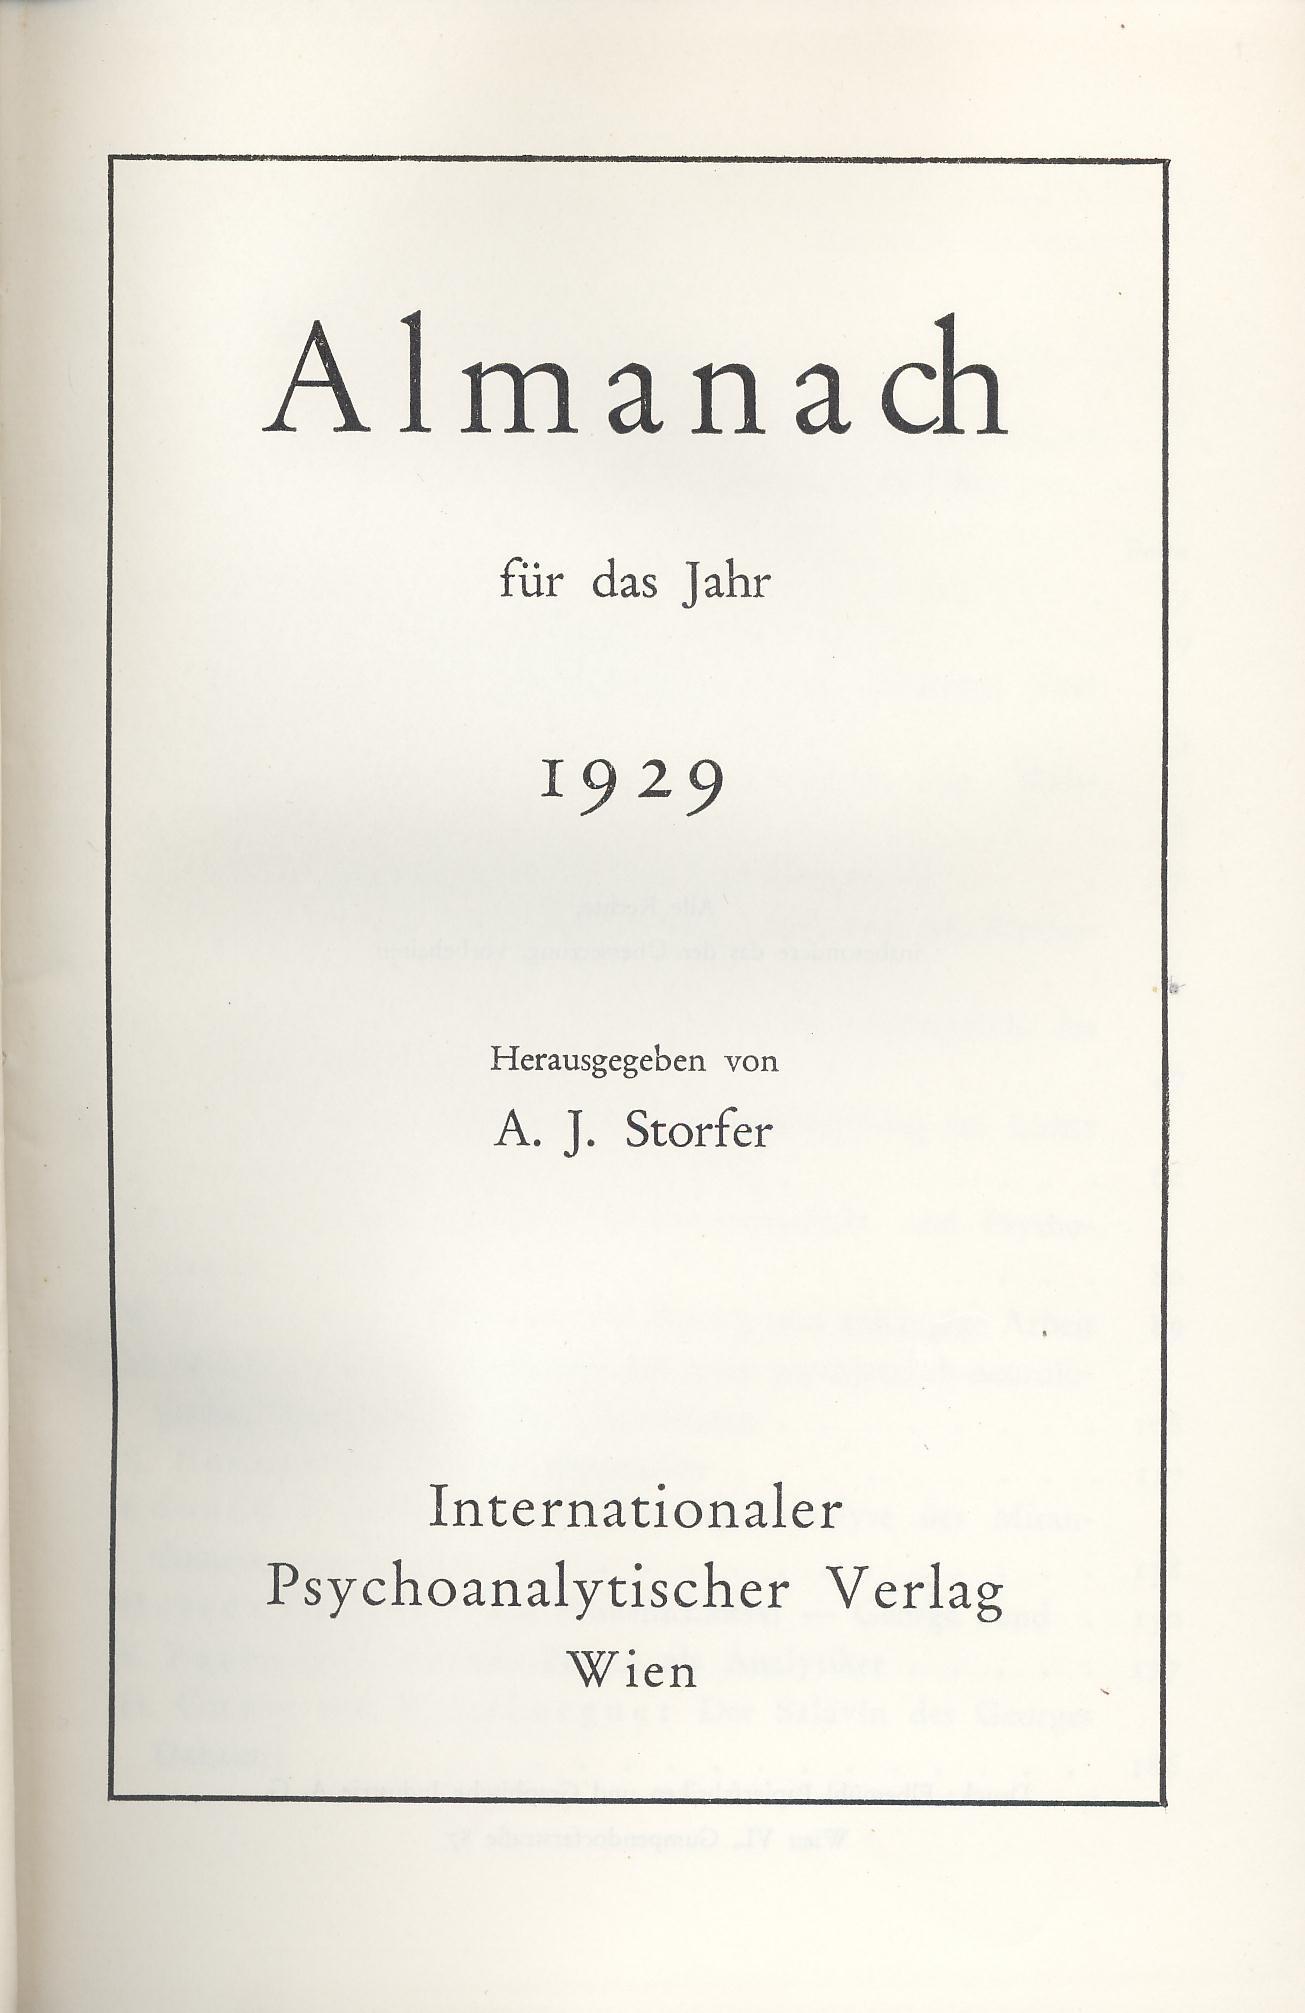 Almanach der Psychoanalyse, 1926–1938 (Reprint)